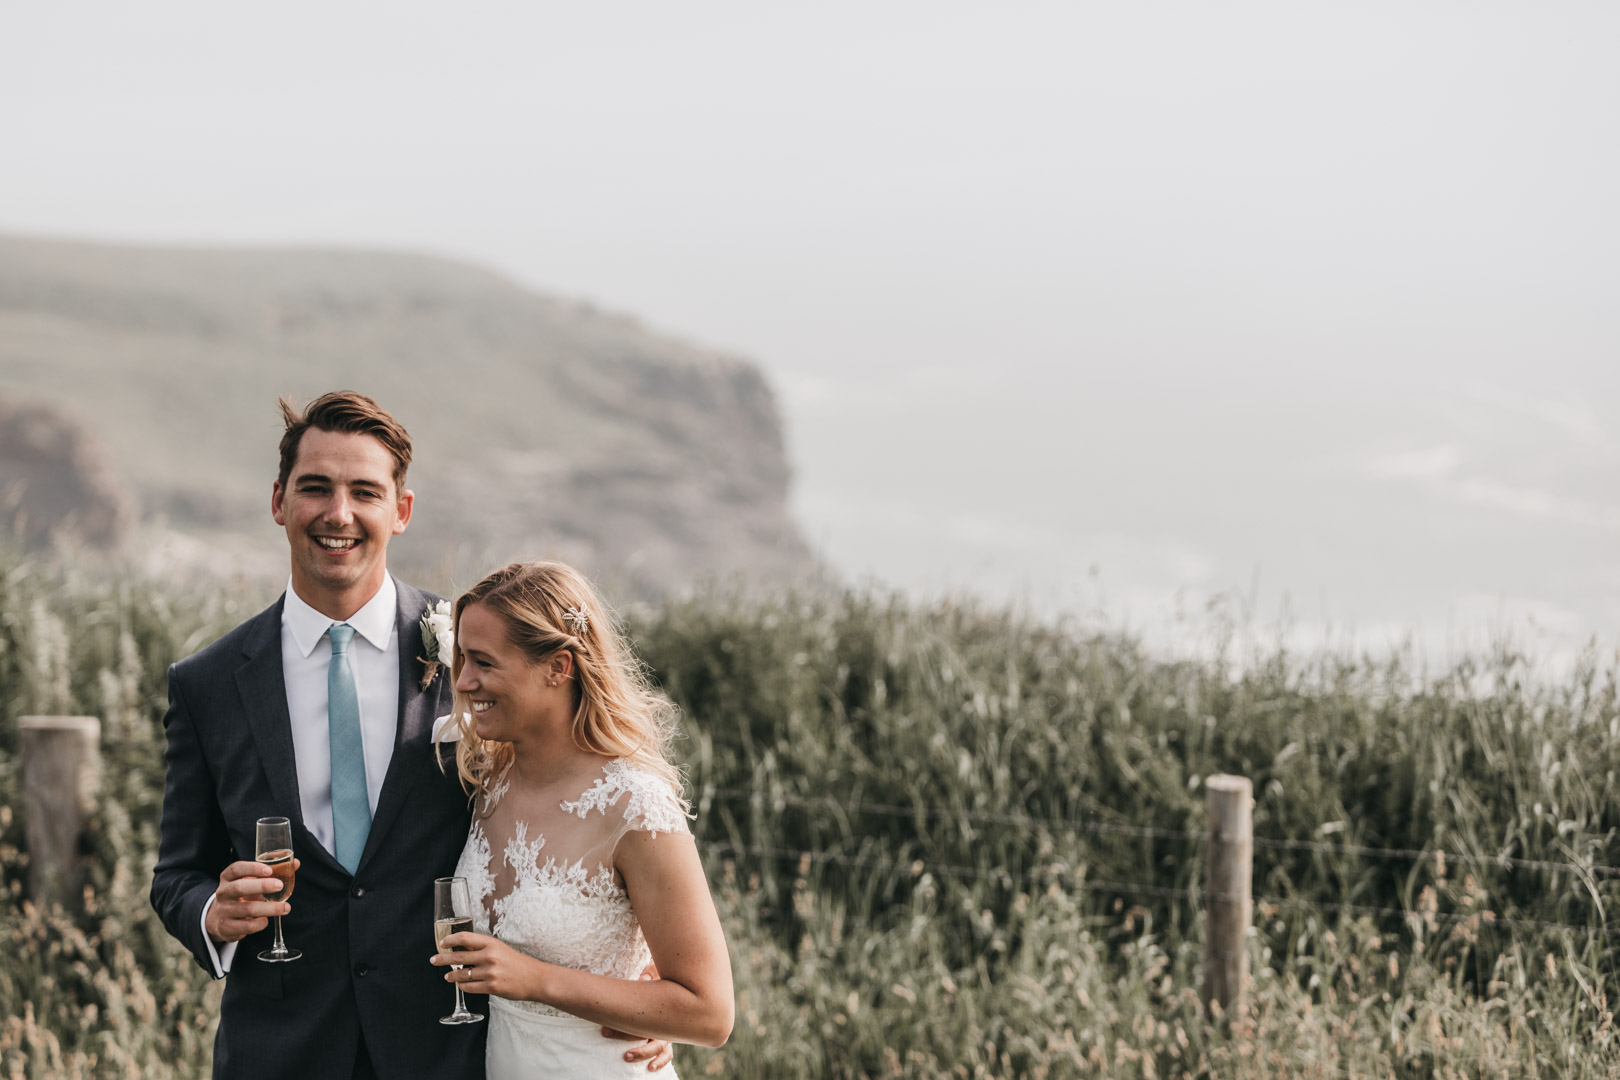 benwigglesworth.com - Wedding Photographer Cornwall - 9.jpg